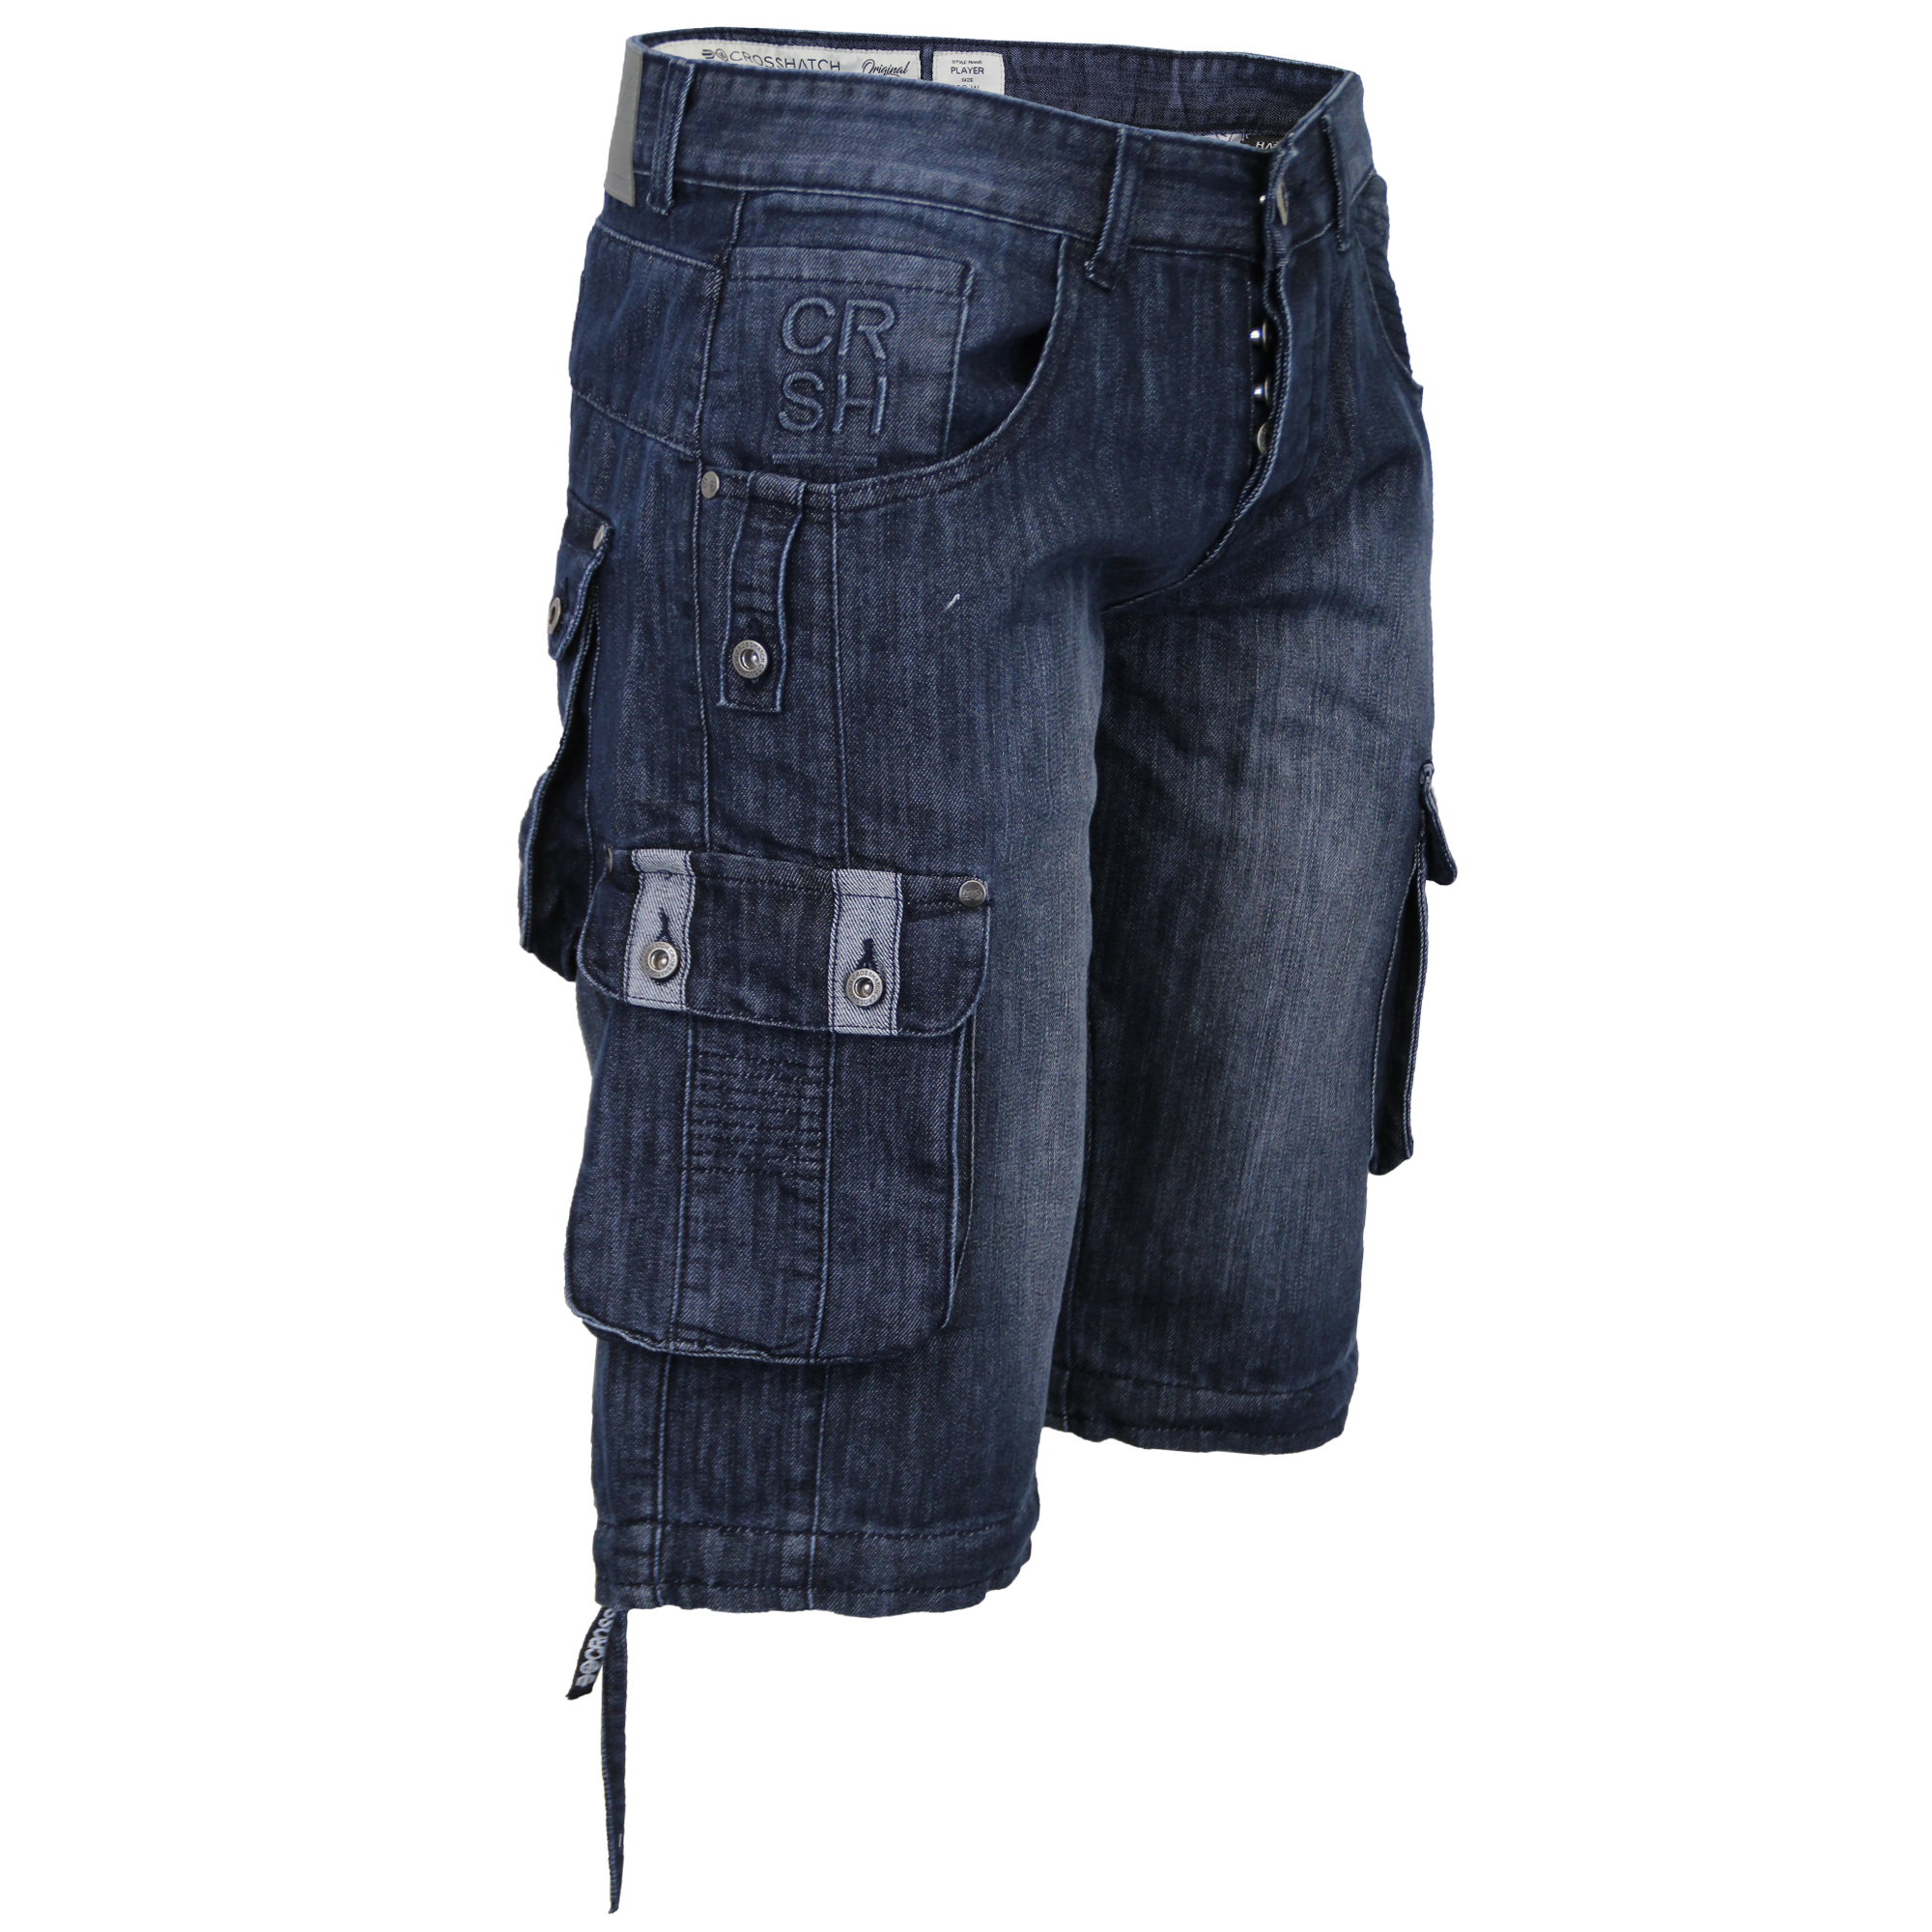 Mens-Denim-Knee-Length-Combat-Shorts-By-Crosshatch thumbnail 13